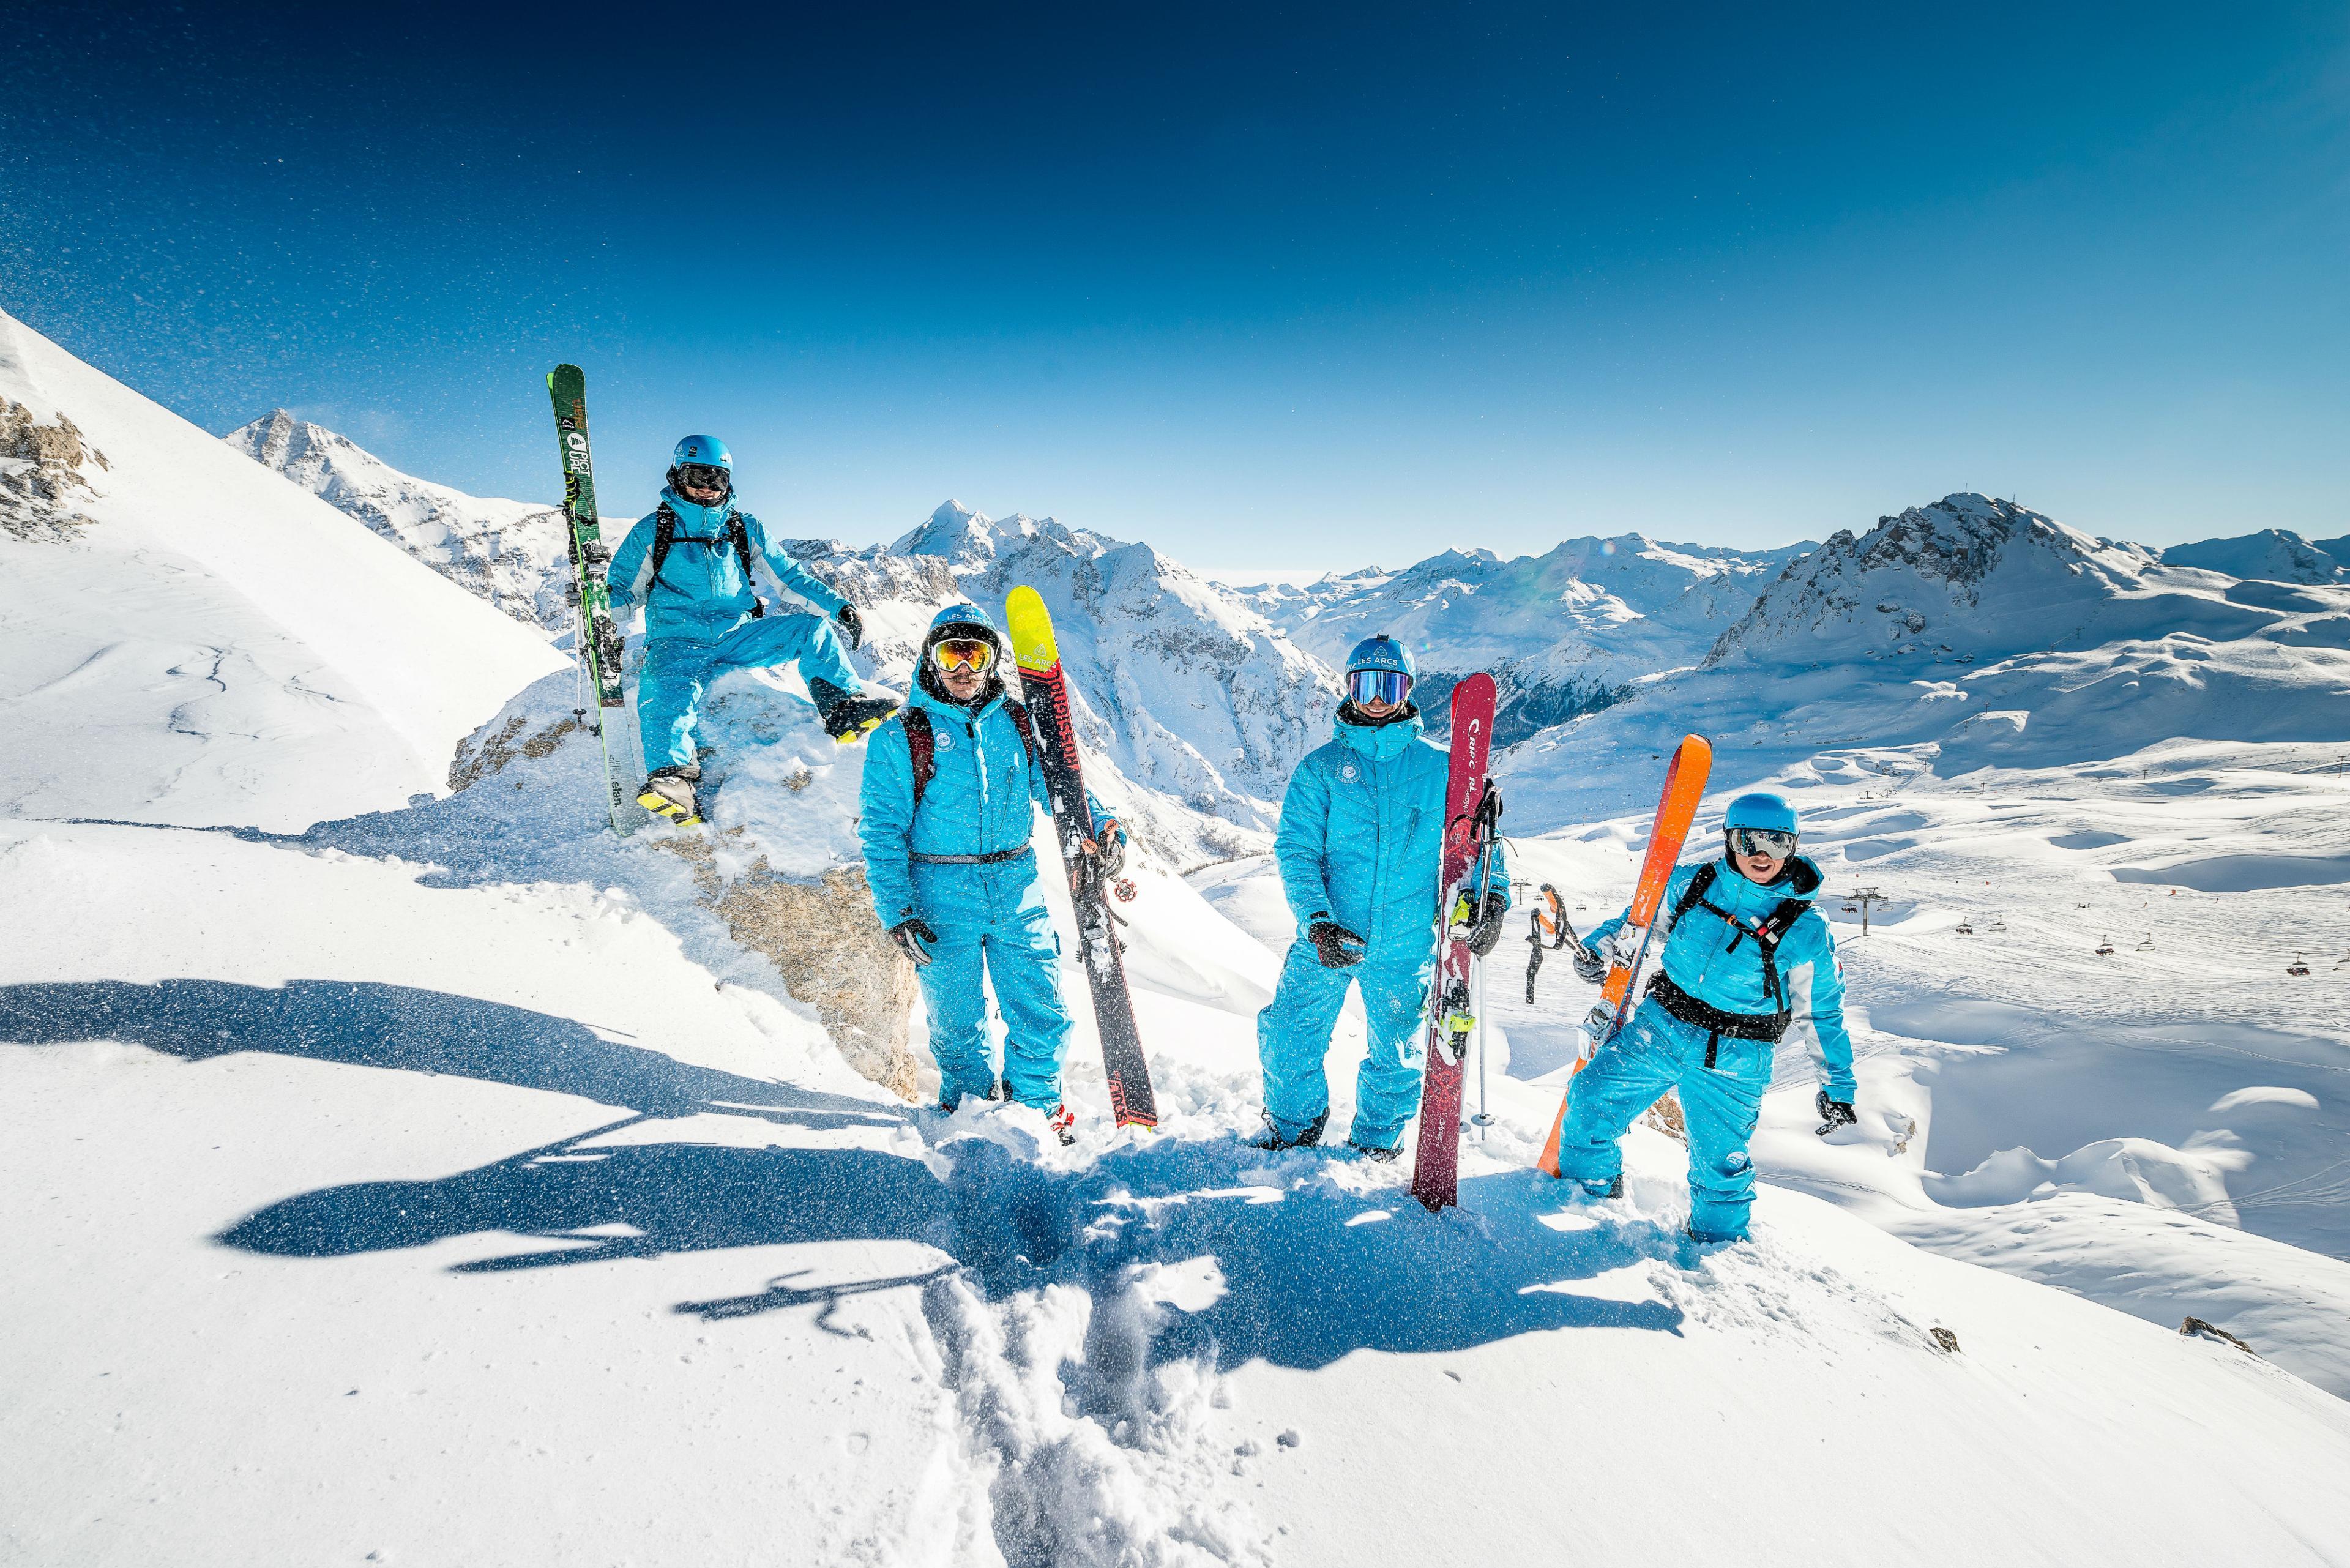 Ski Lessons for Adults - 2 Days - Beginner